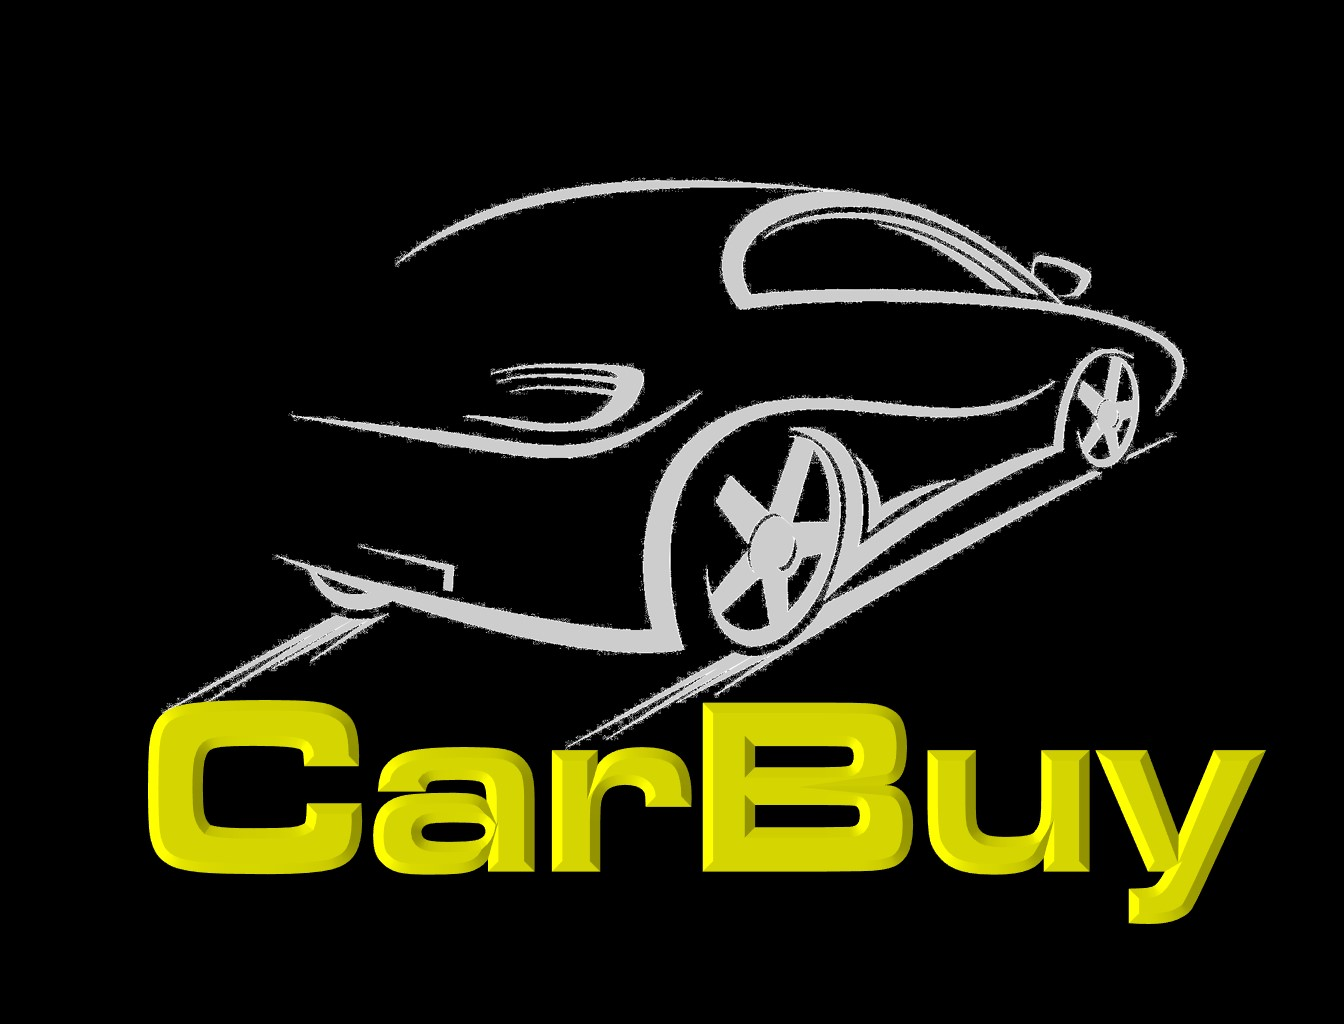 Carbuy รับซื้อรถมือสอง